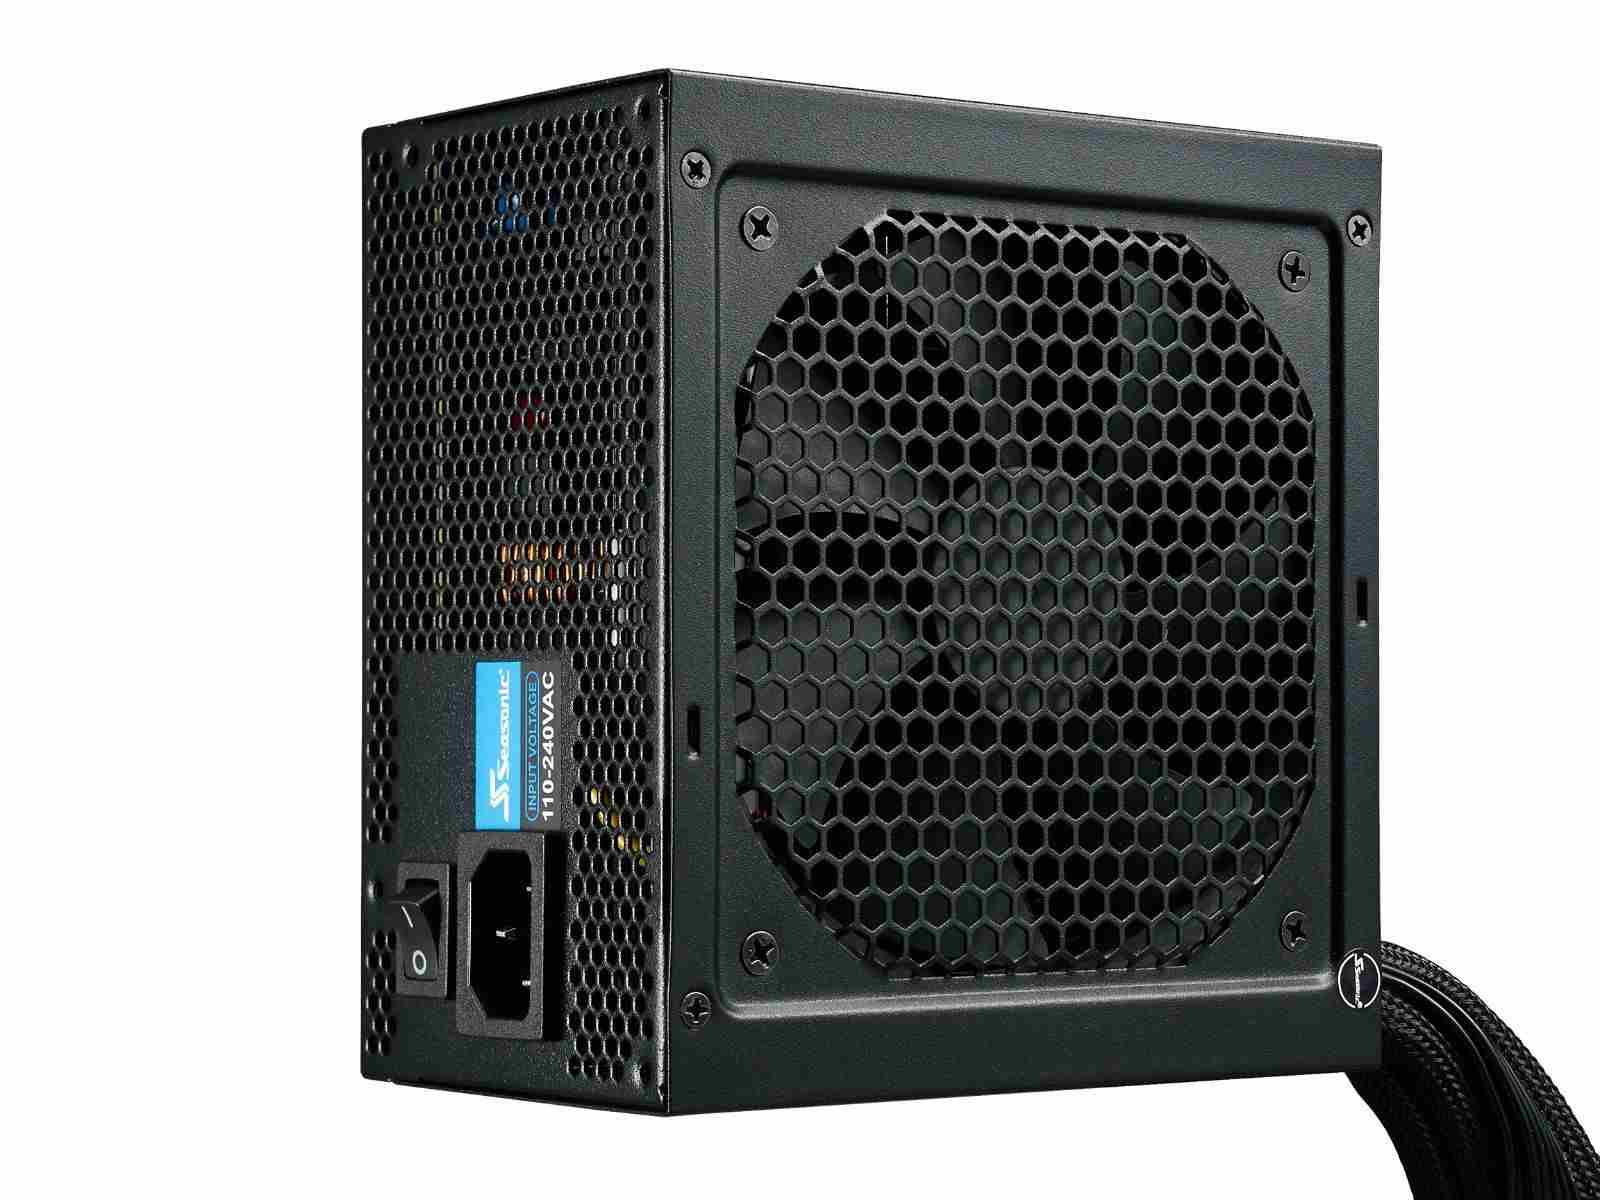 SEASONIC zdroj 550W S12III-550 TTM (SSR-550GB3), 80+ BRONZE, 1Y55GB3RT3A11X